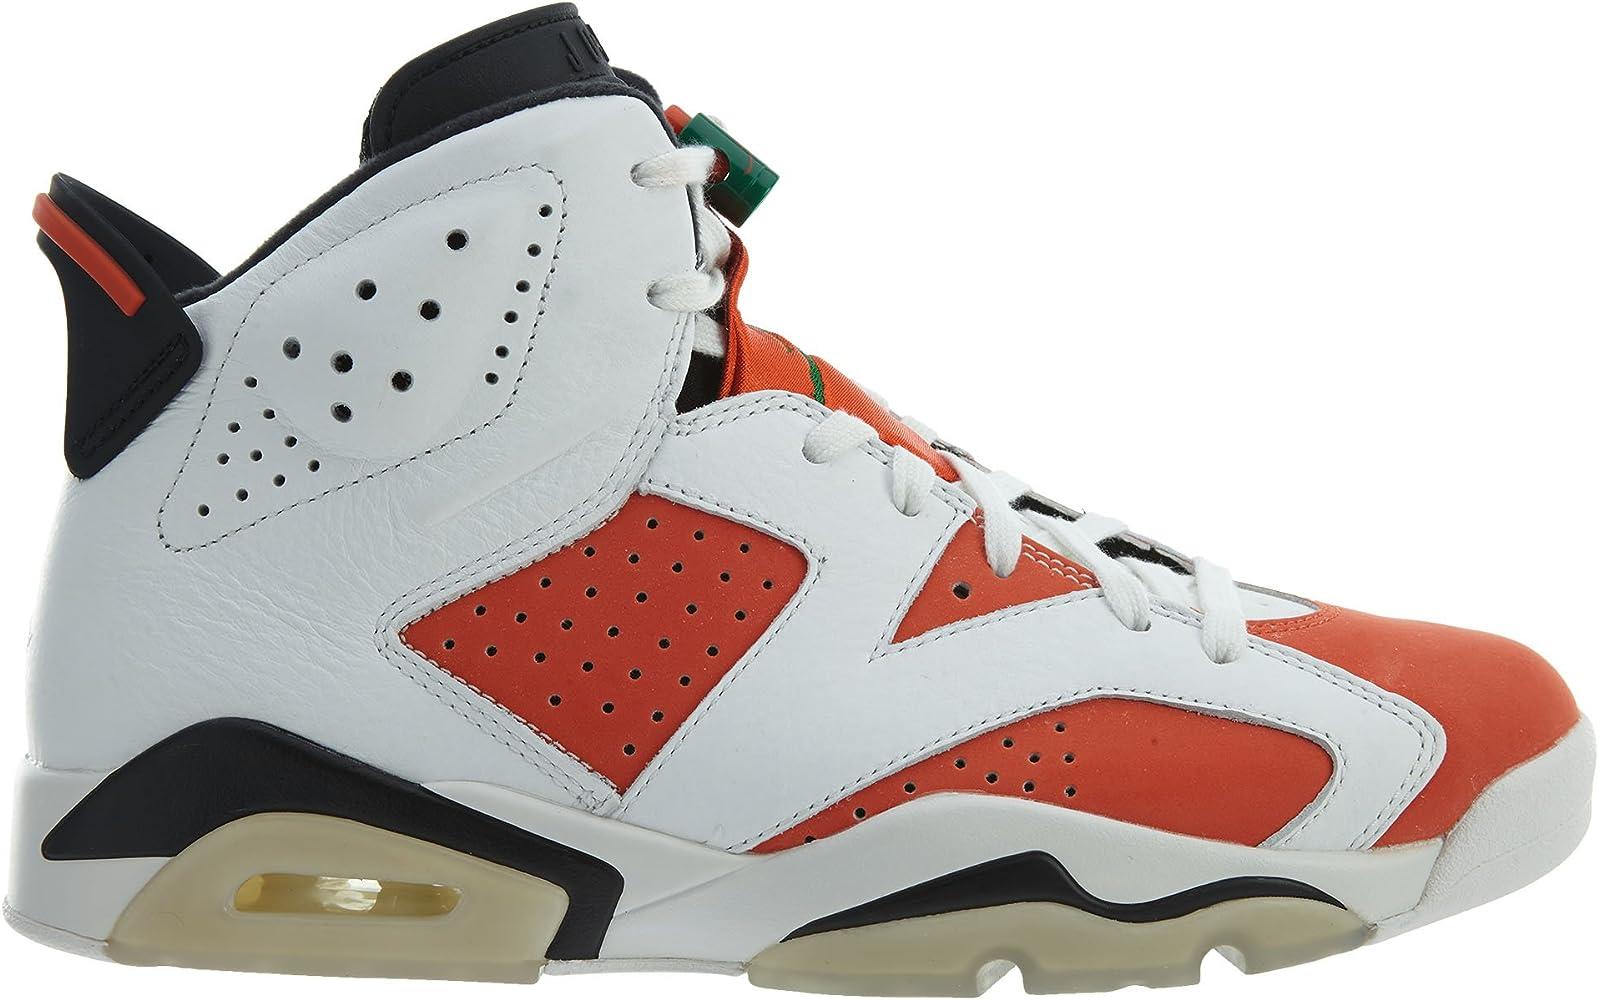 competitive price e2a16 5320a Air Jordan 6 Retro